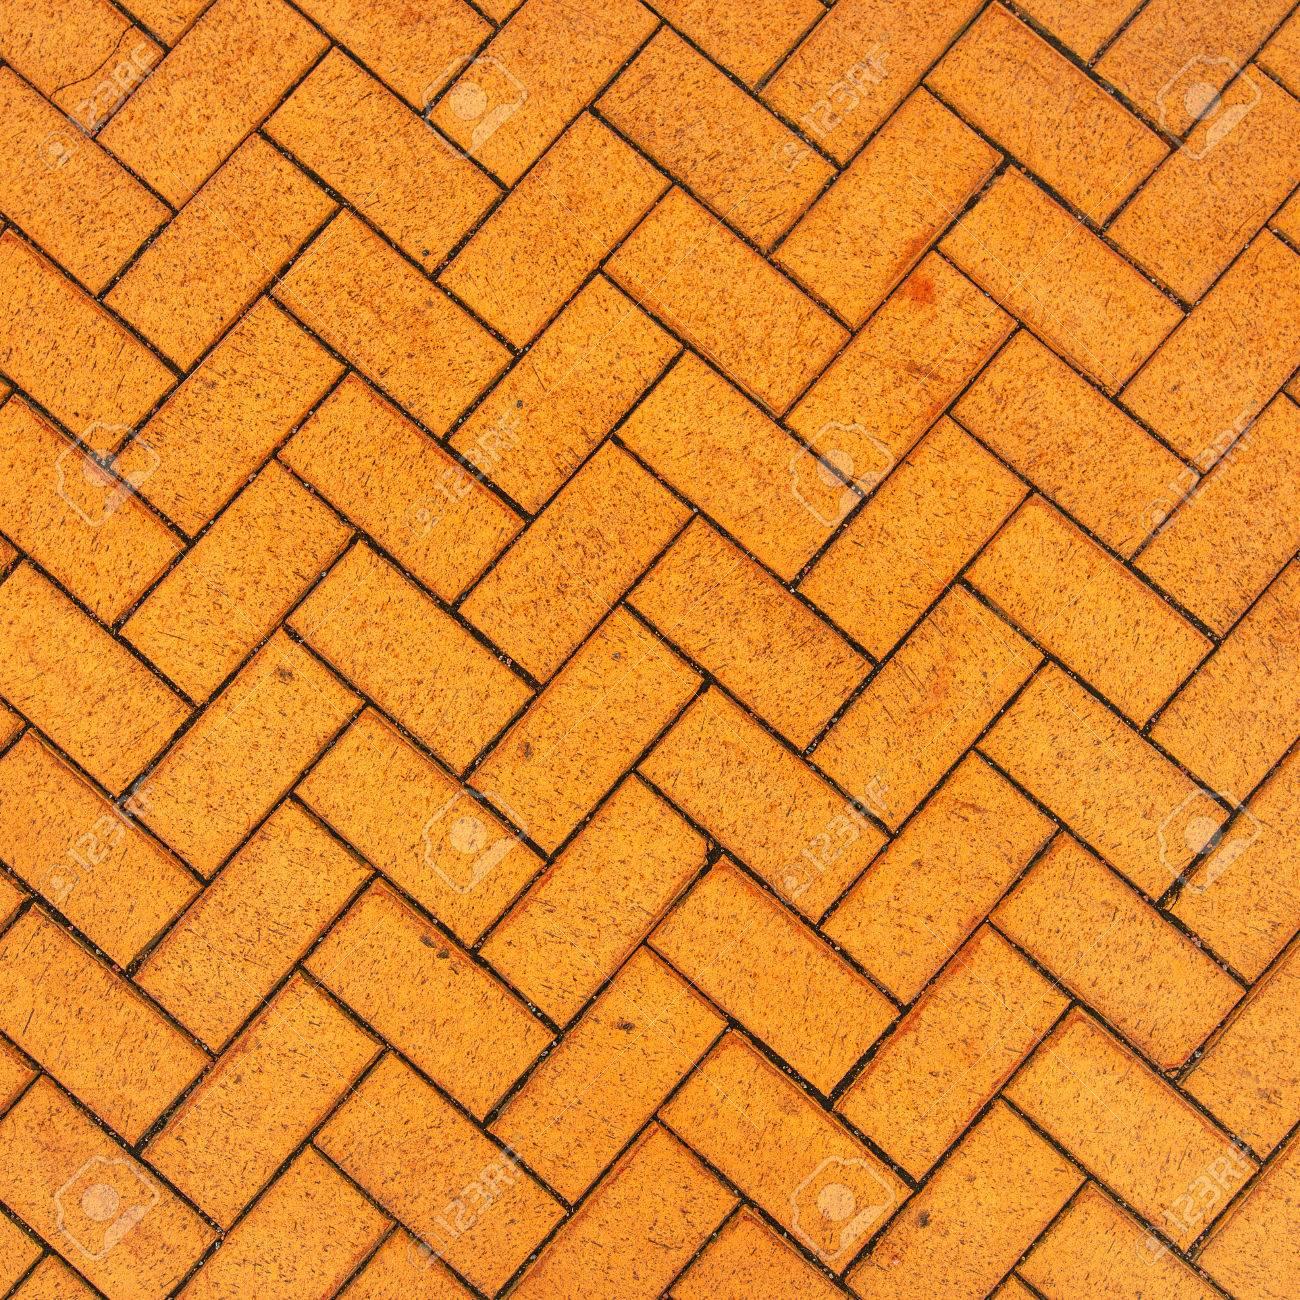 Orange Zigzag Brick Paving Texture Top View Sample Of Urban Background Stock Photo